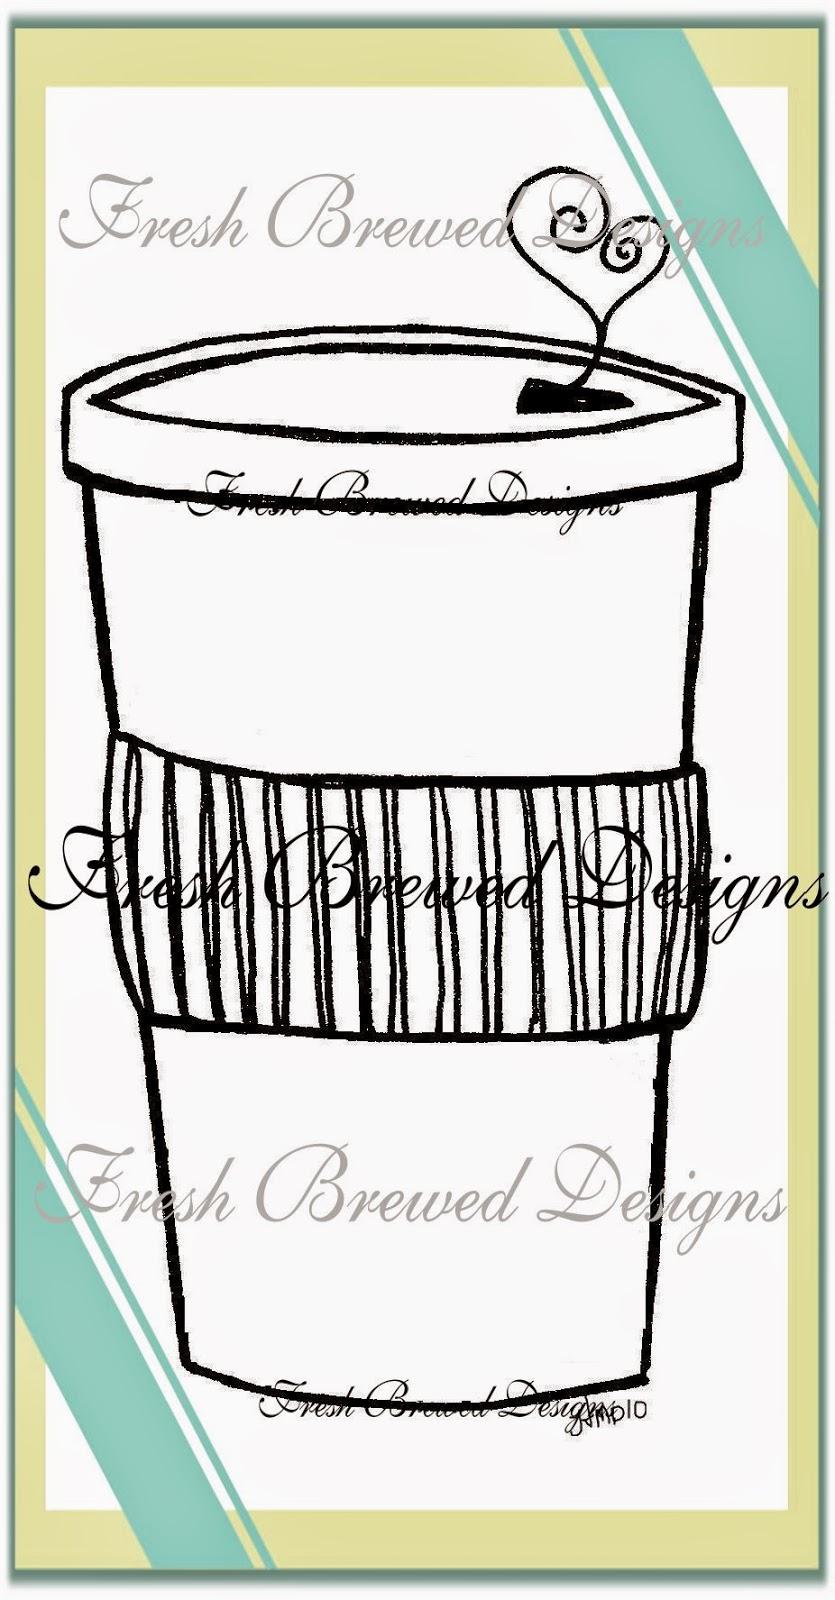 http://www.freshbreweddesigns.com/item_582/Latte-Cup.htm